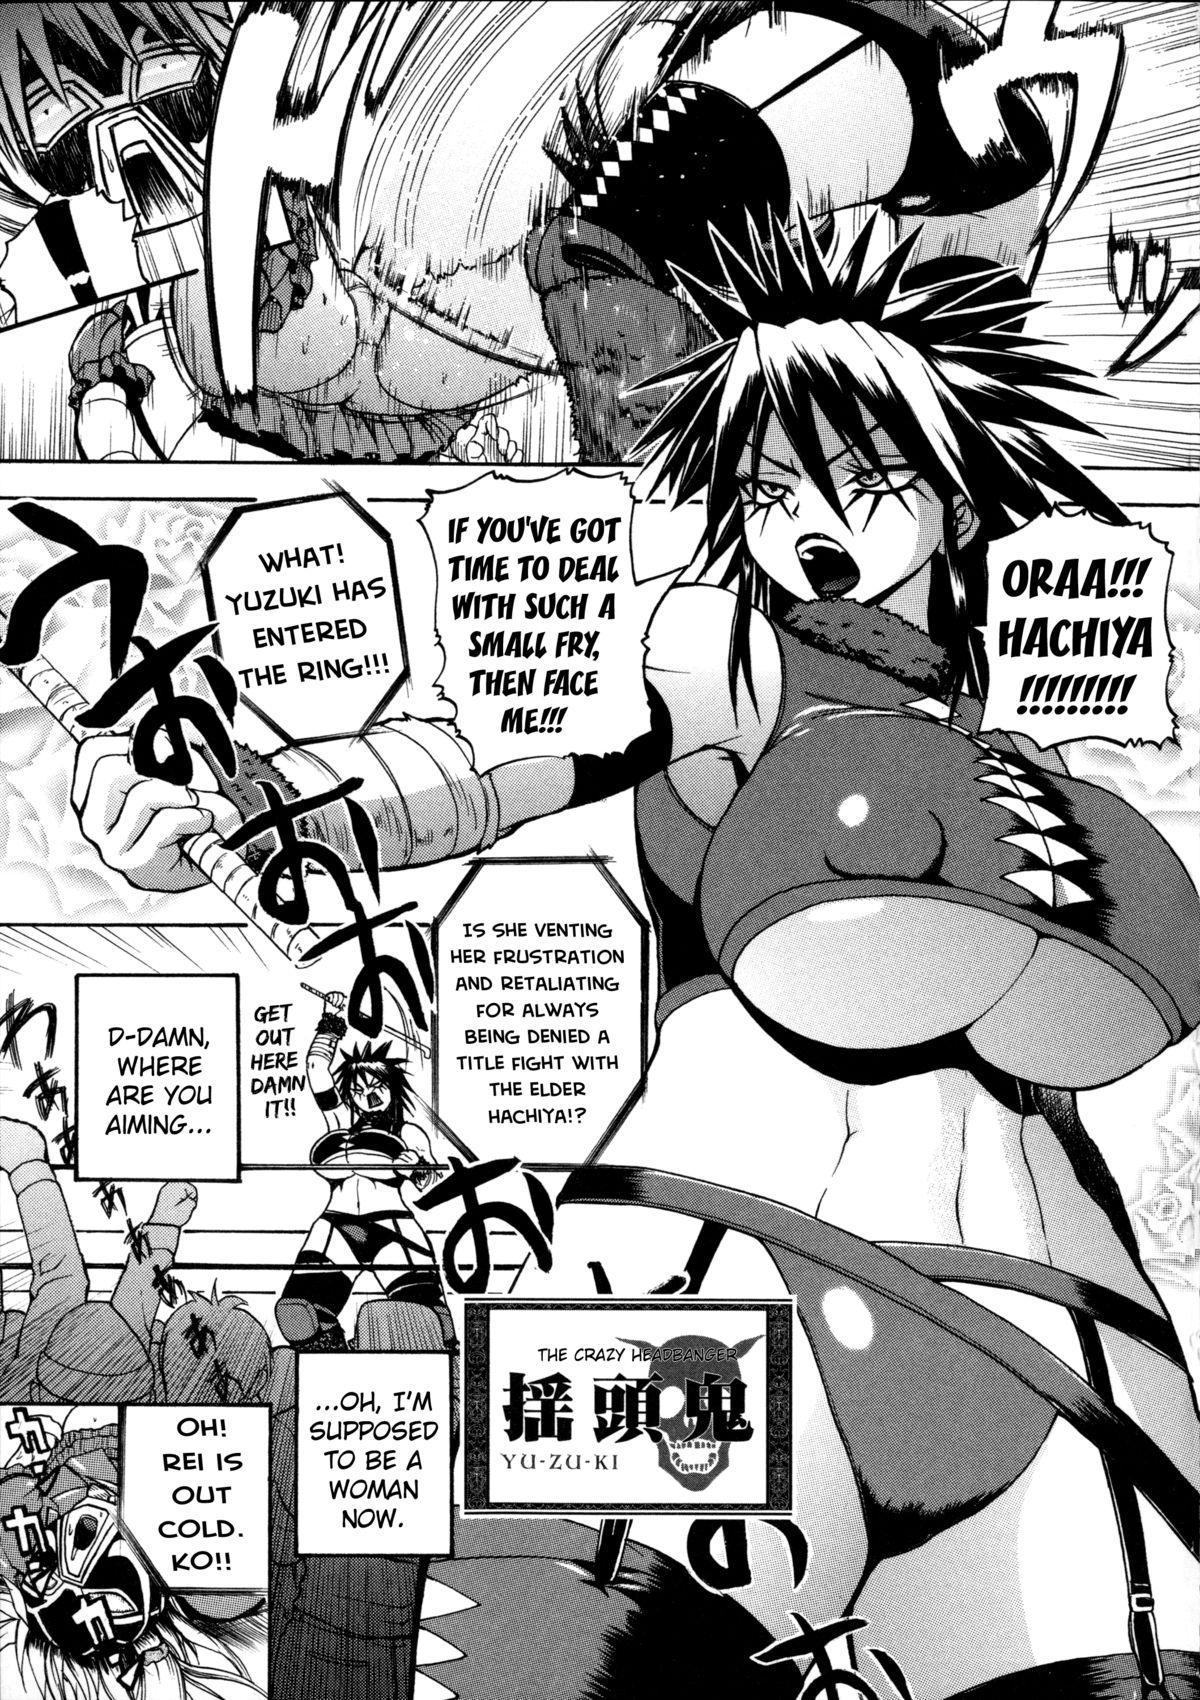 [Yoshimura Tatsumaki] Monzetsu Taigatame ~Count 3 de Ikasete Ageru~ | Faint in Agony Bodylock ~I'll make you cum on the count of 3~ Ch. 1 [English] [Brolen+drozetta] 25